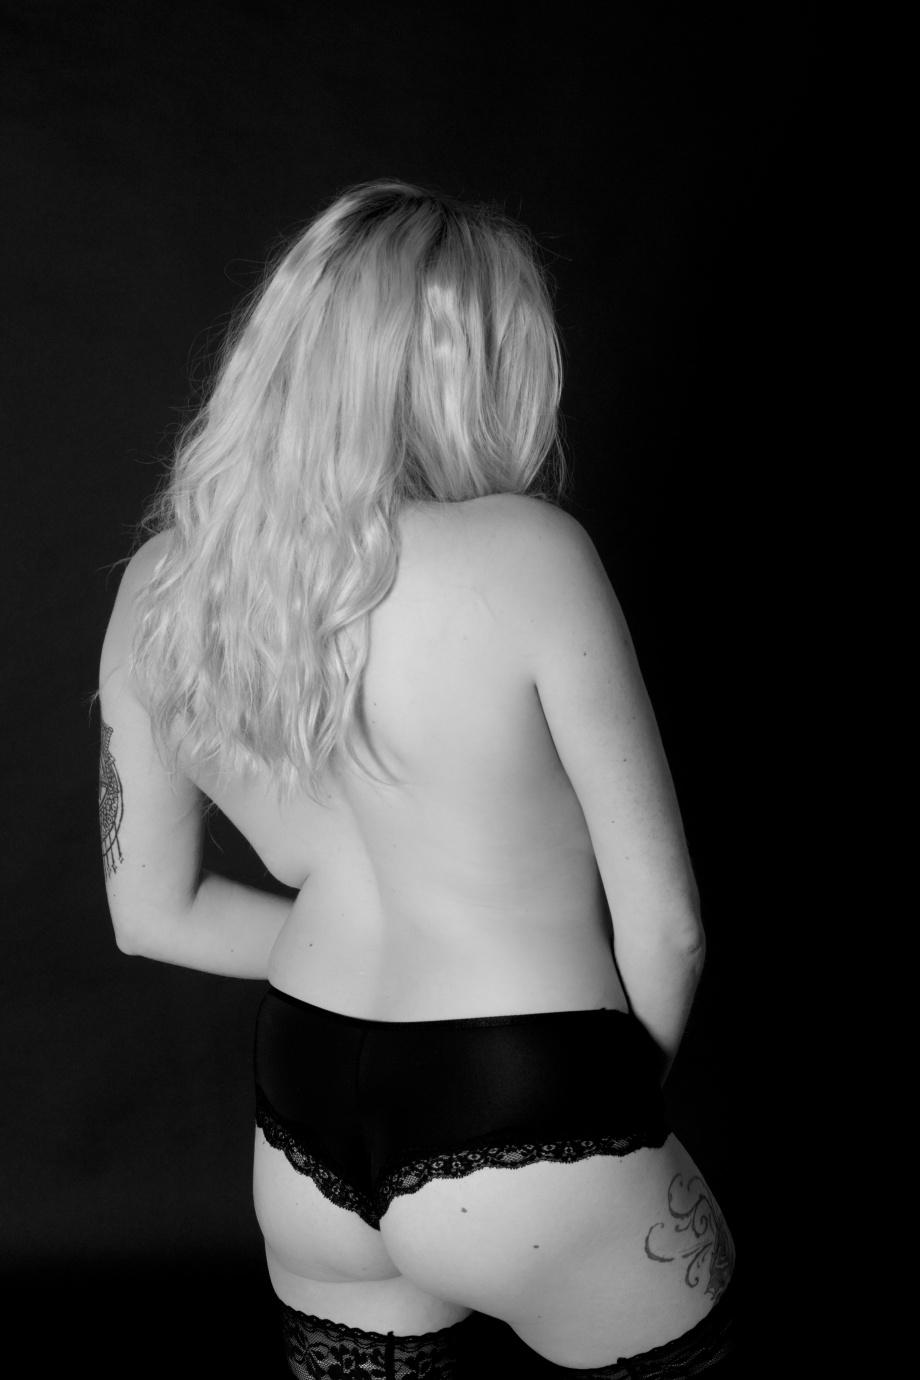 portrait, black and white, studio, glamour, ireland, cork, blonde, lingerie, boudoir, topless, implied